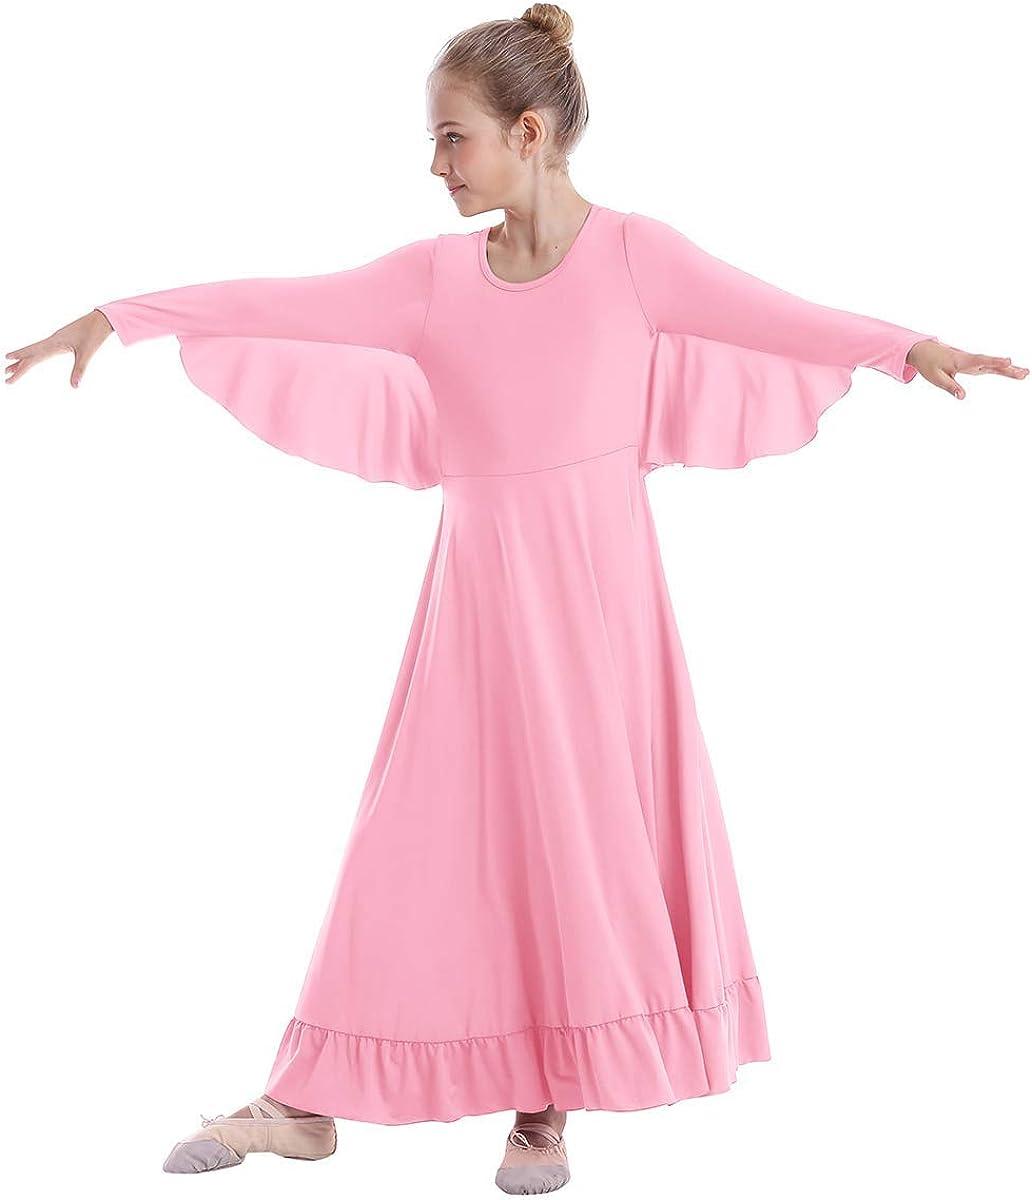 Girls Angel Isis Wings Worship Liturgical Praise Dance Dress Church Robe Kids Ruffle Full Length Ballet Gown Dancewear